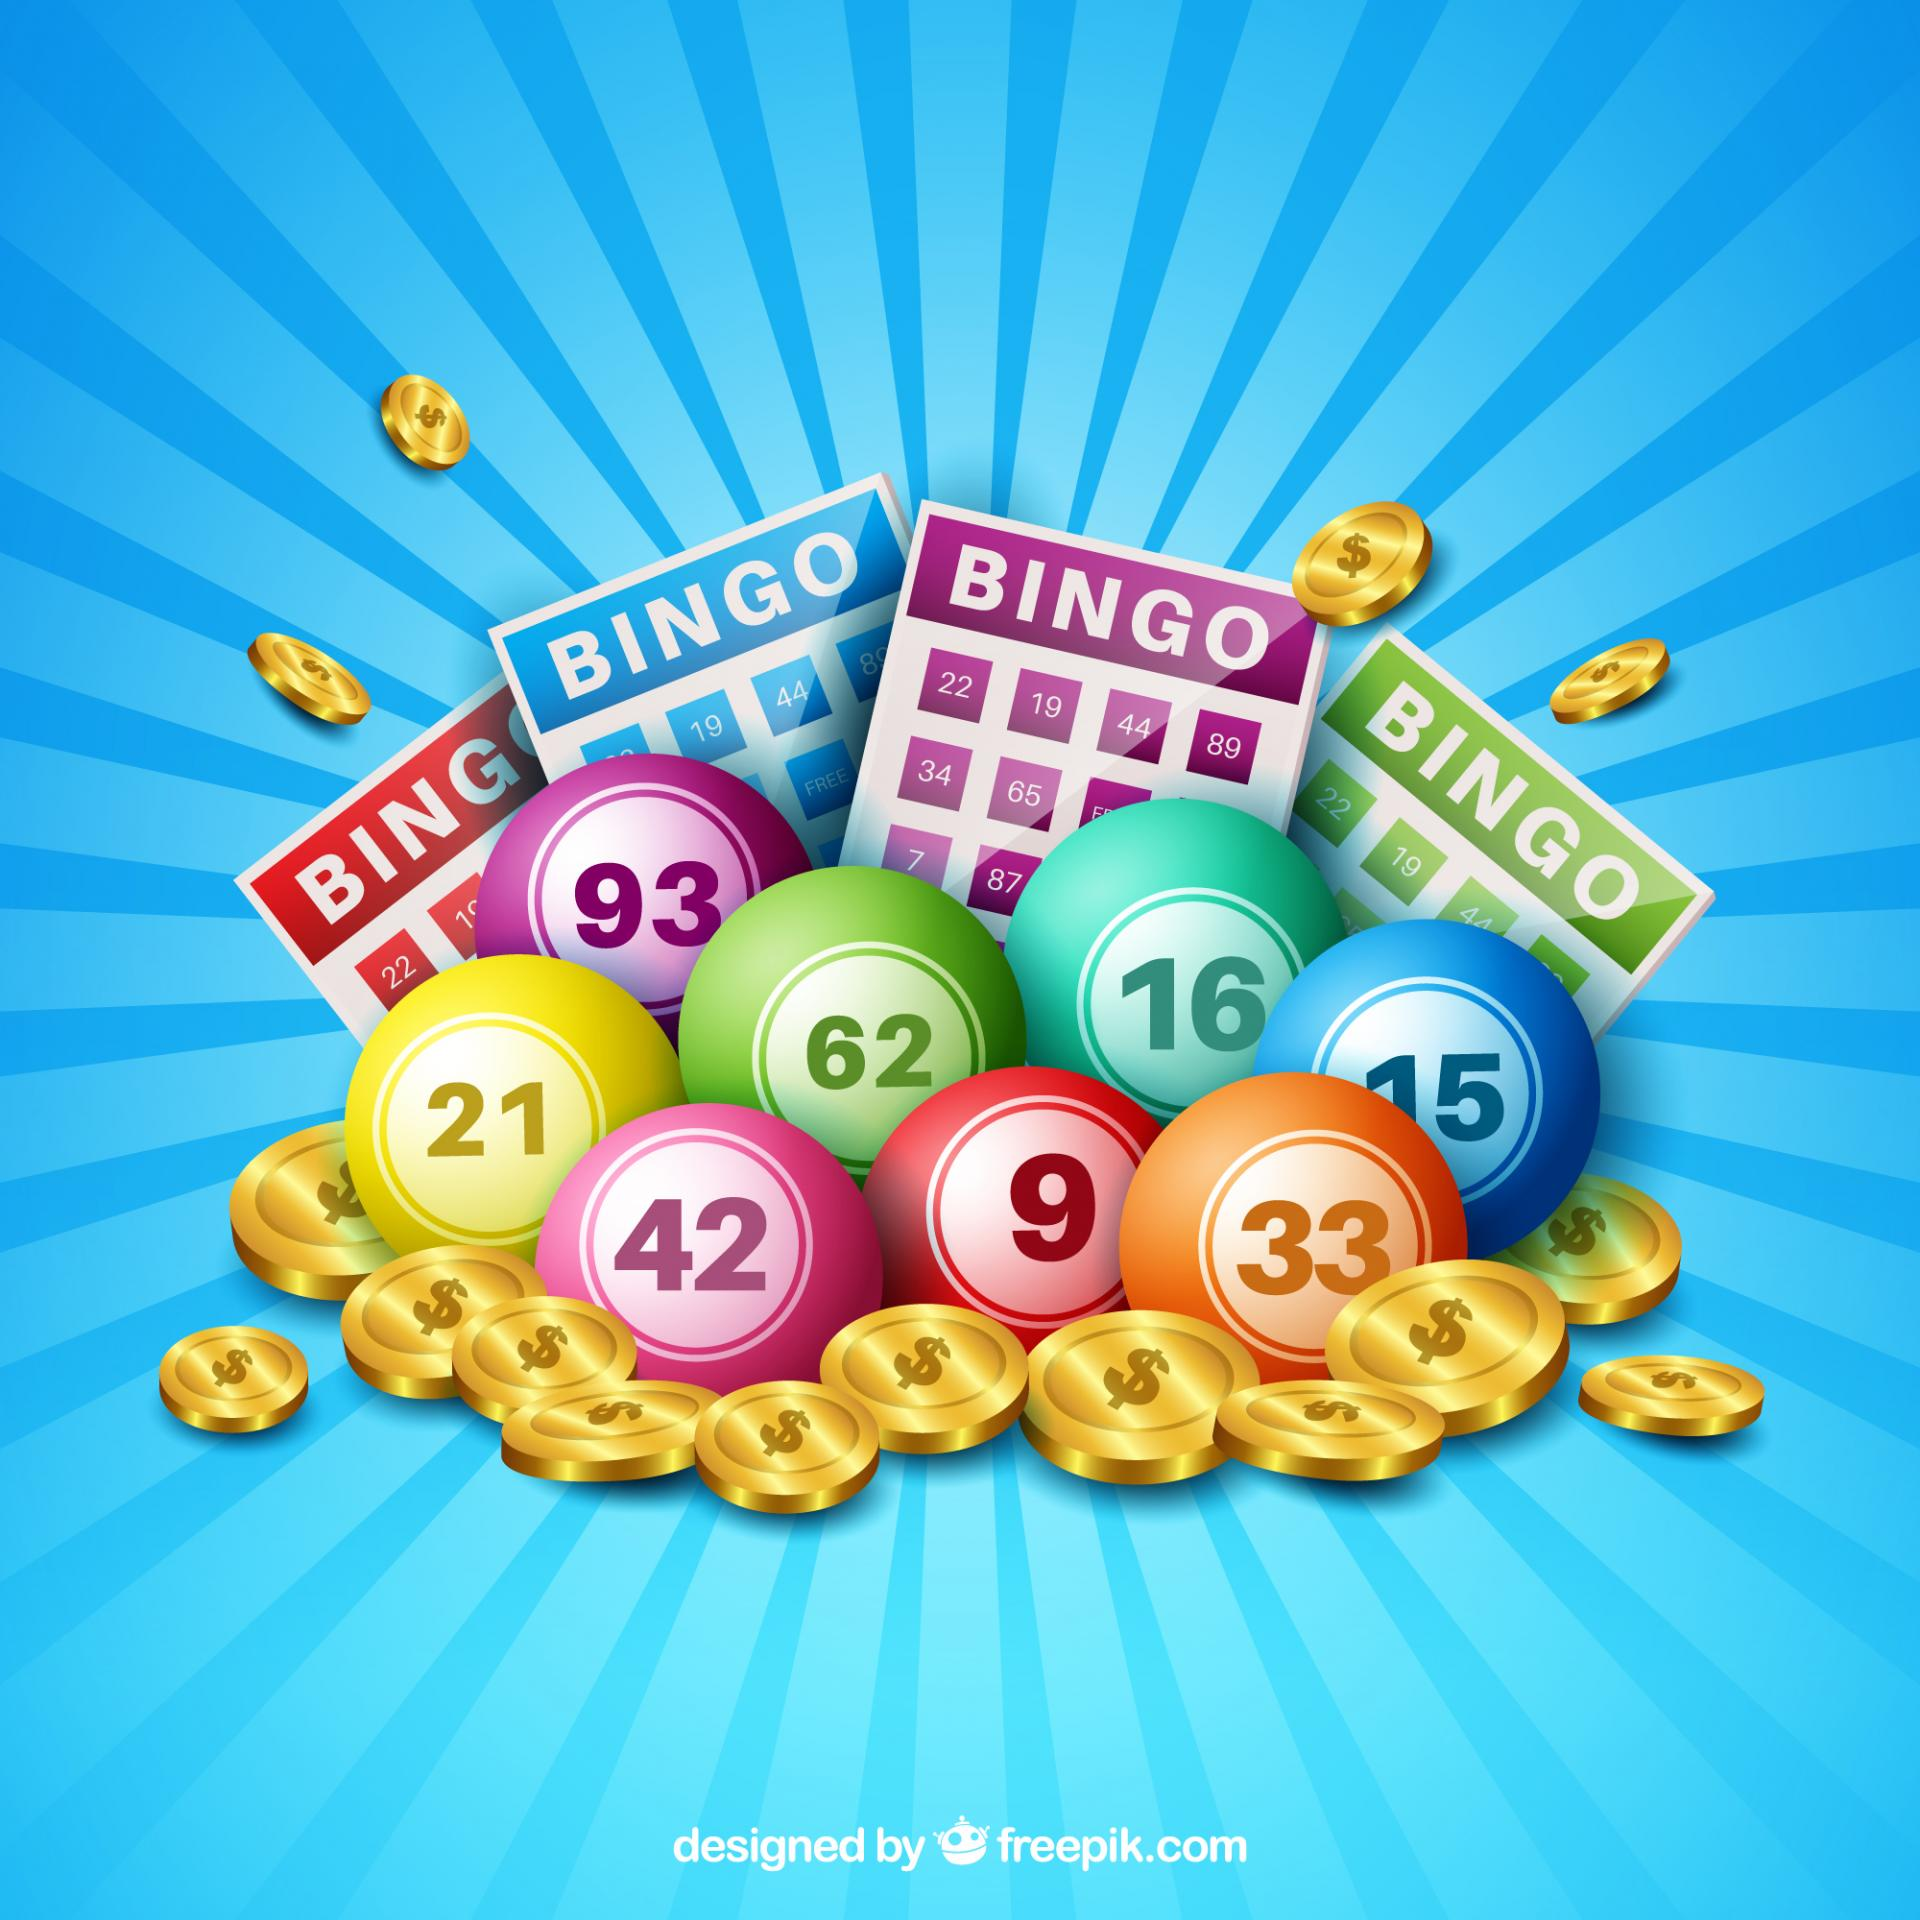 Dessin loto bingo 6